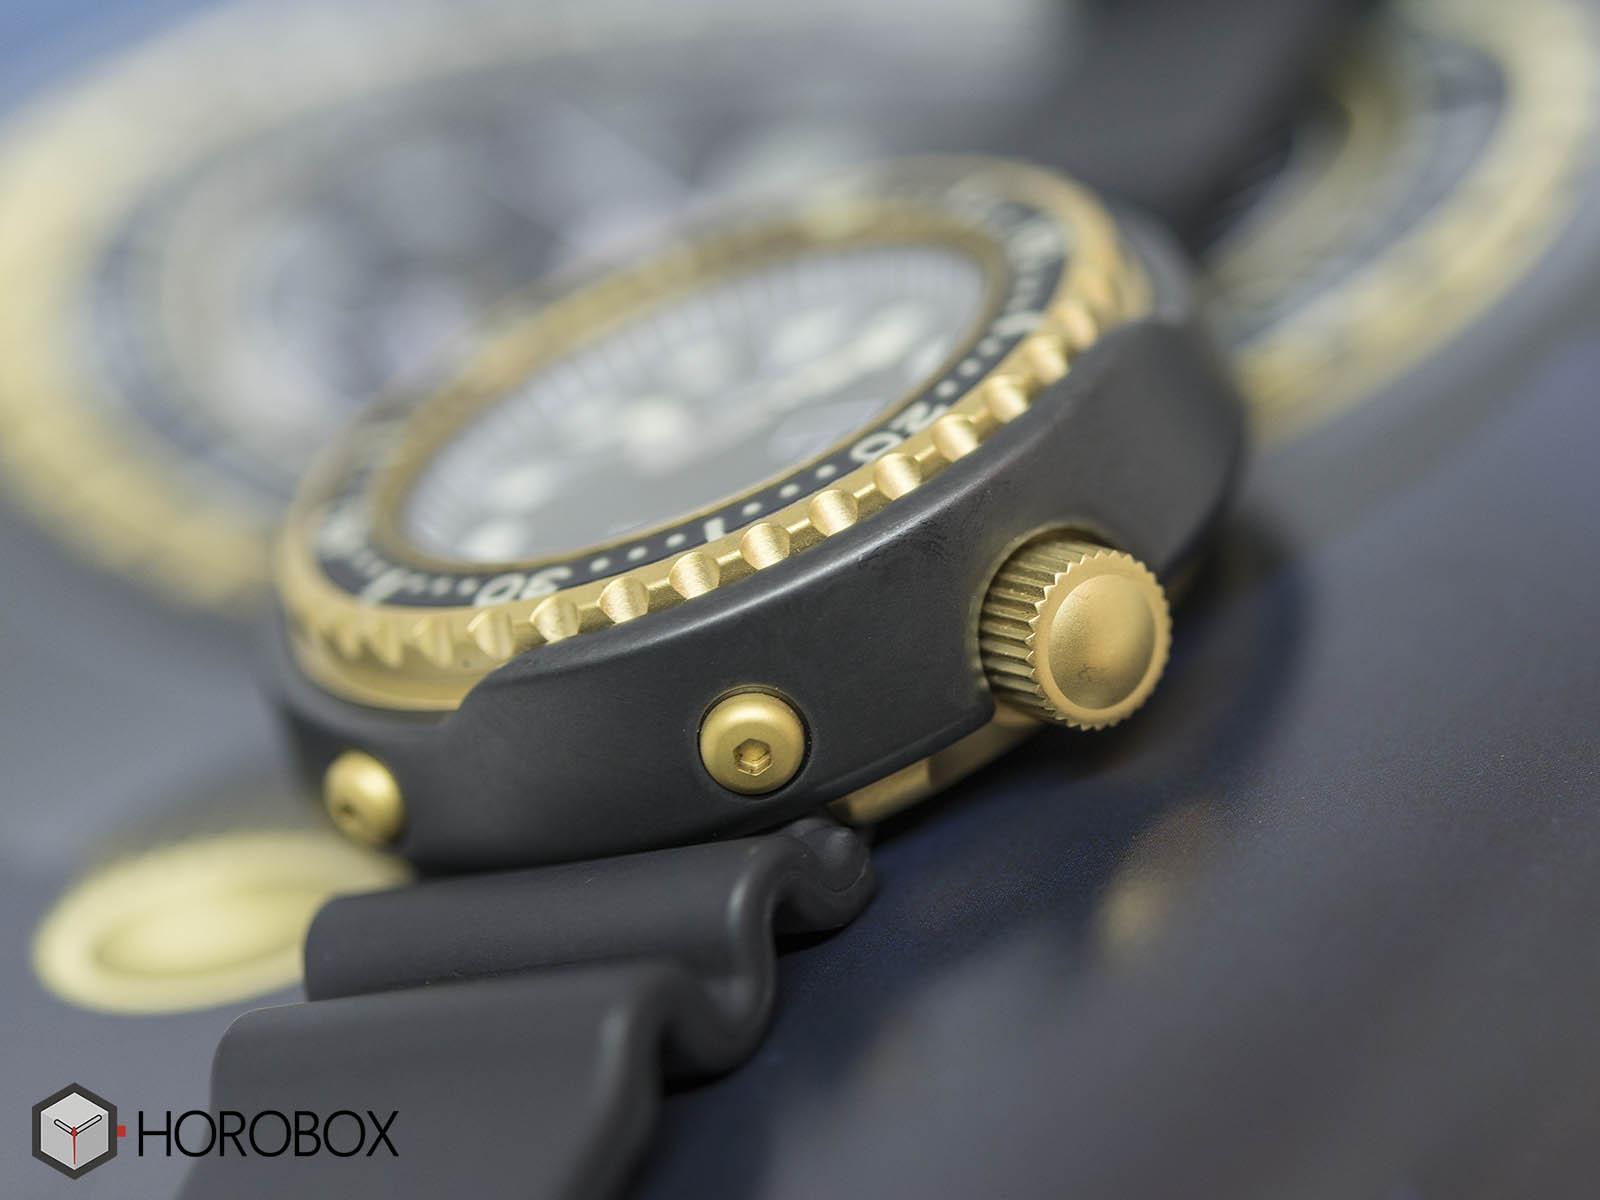 s23626-seiko-prospex-1000m-limited-edition-5.jpg